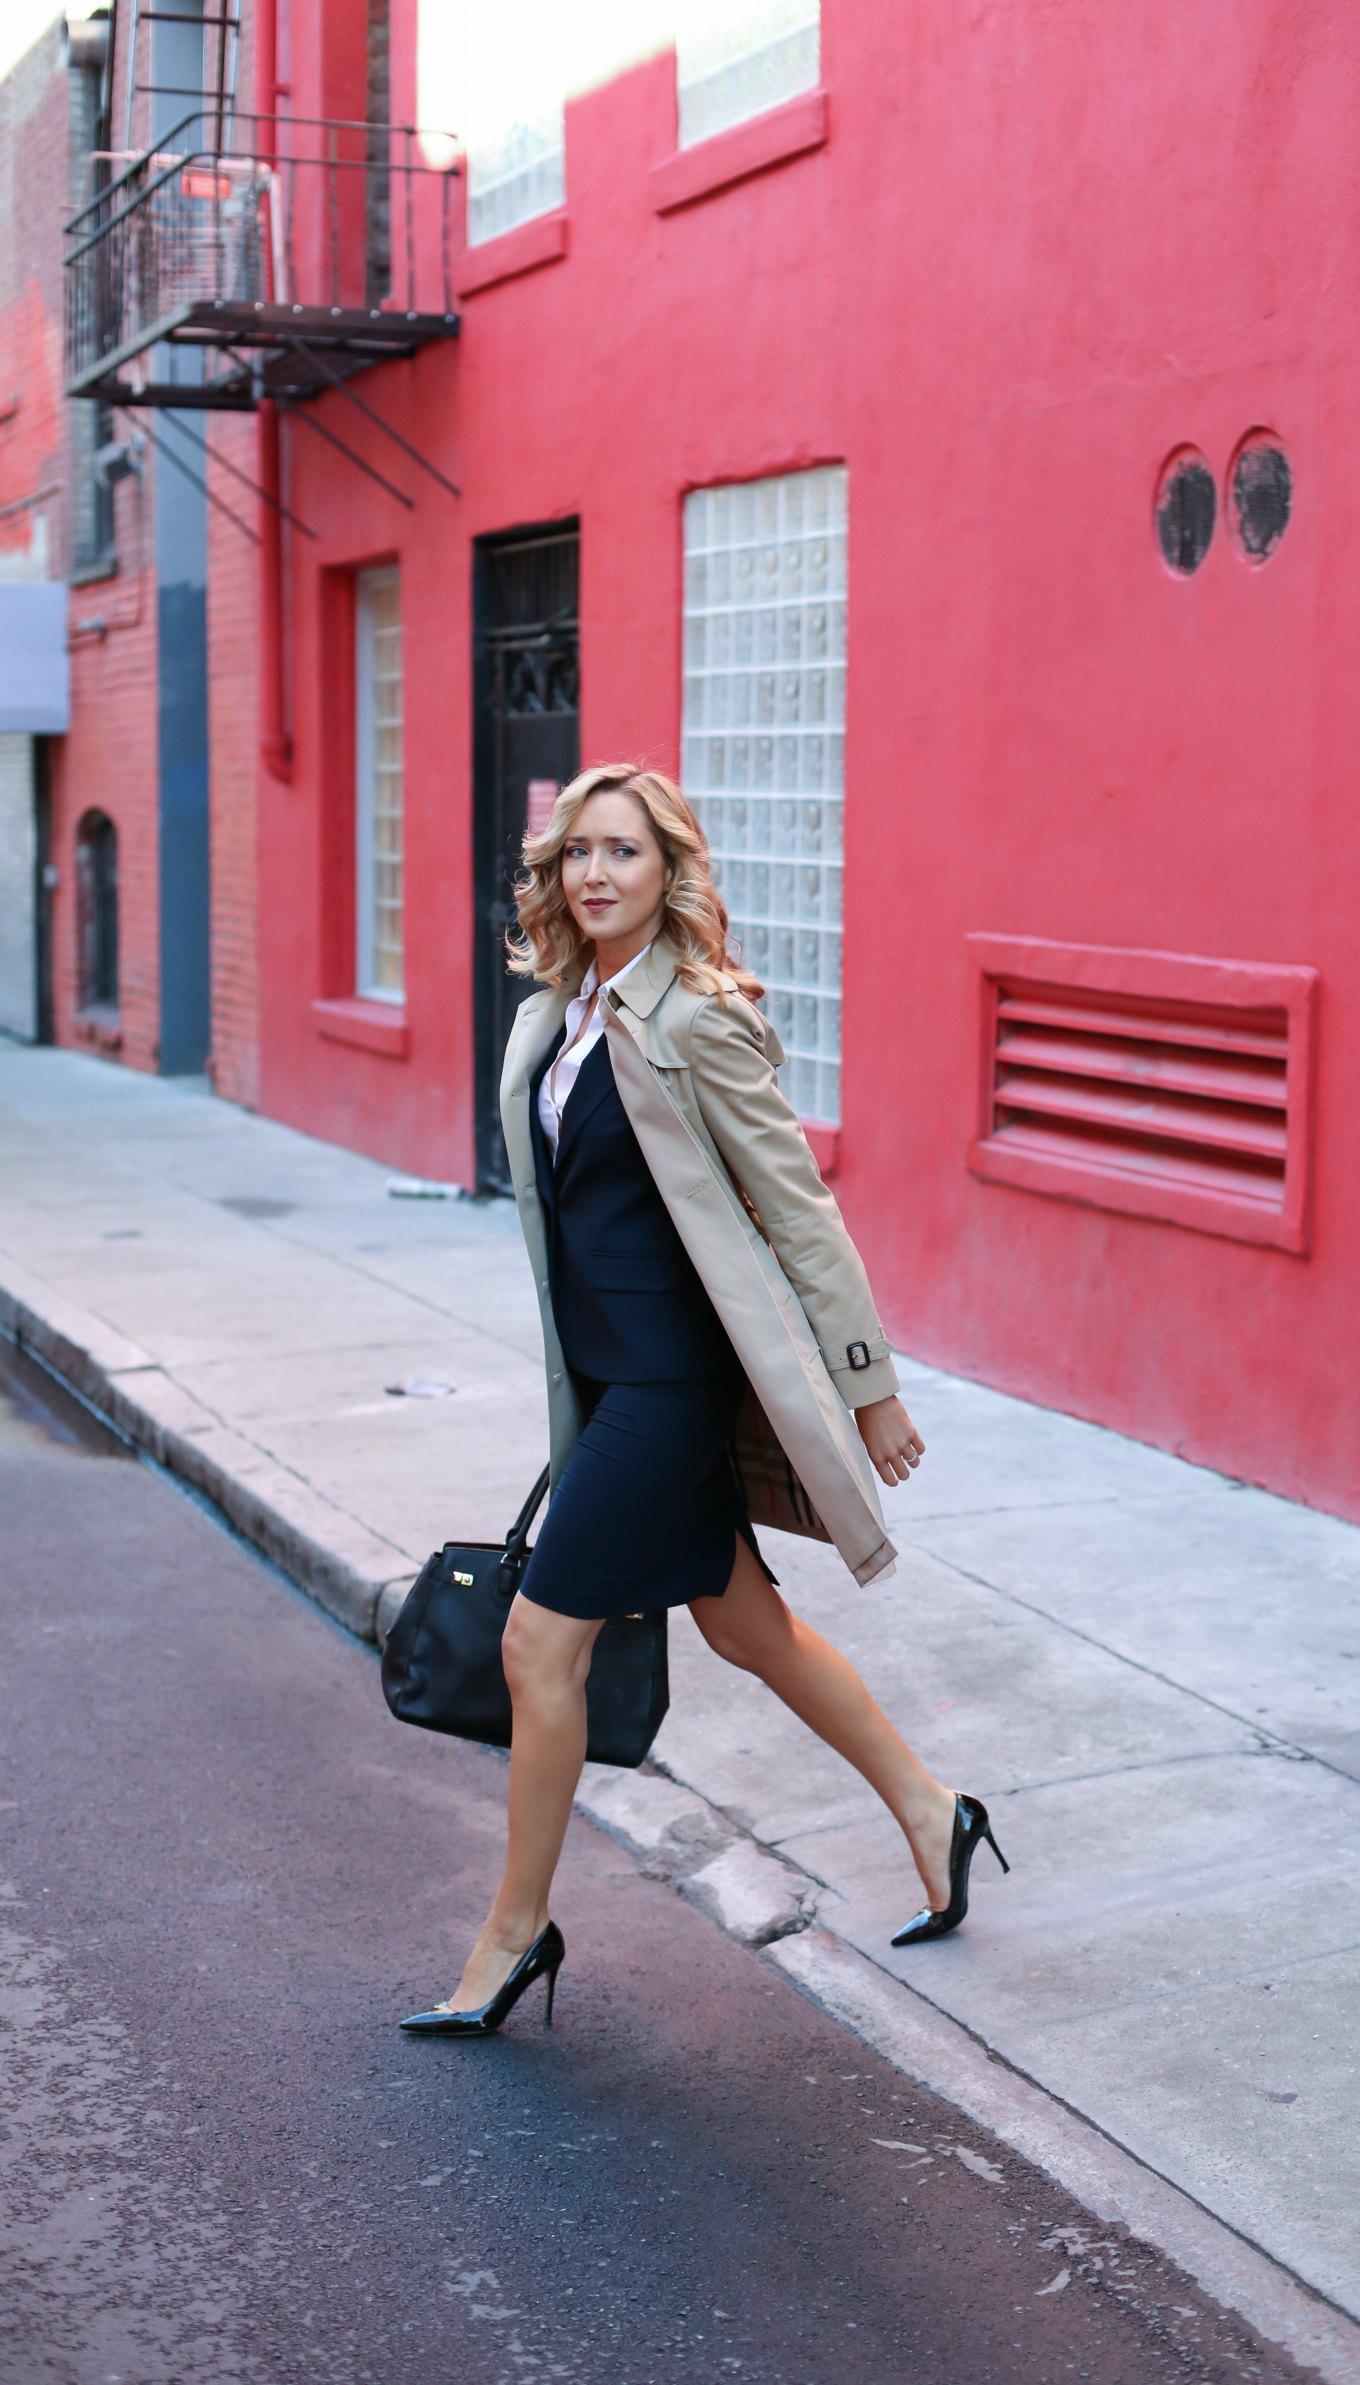 burberry-kensington-trench-coat-henri-bendel-black-carlyle-tote-work-wear interview-attire-professional-women-staples-fashion-style-blog-2